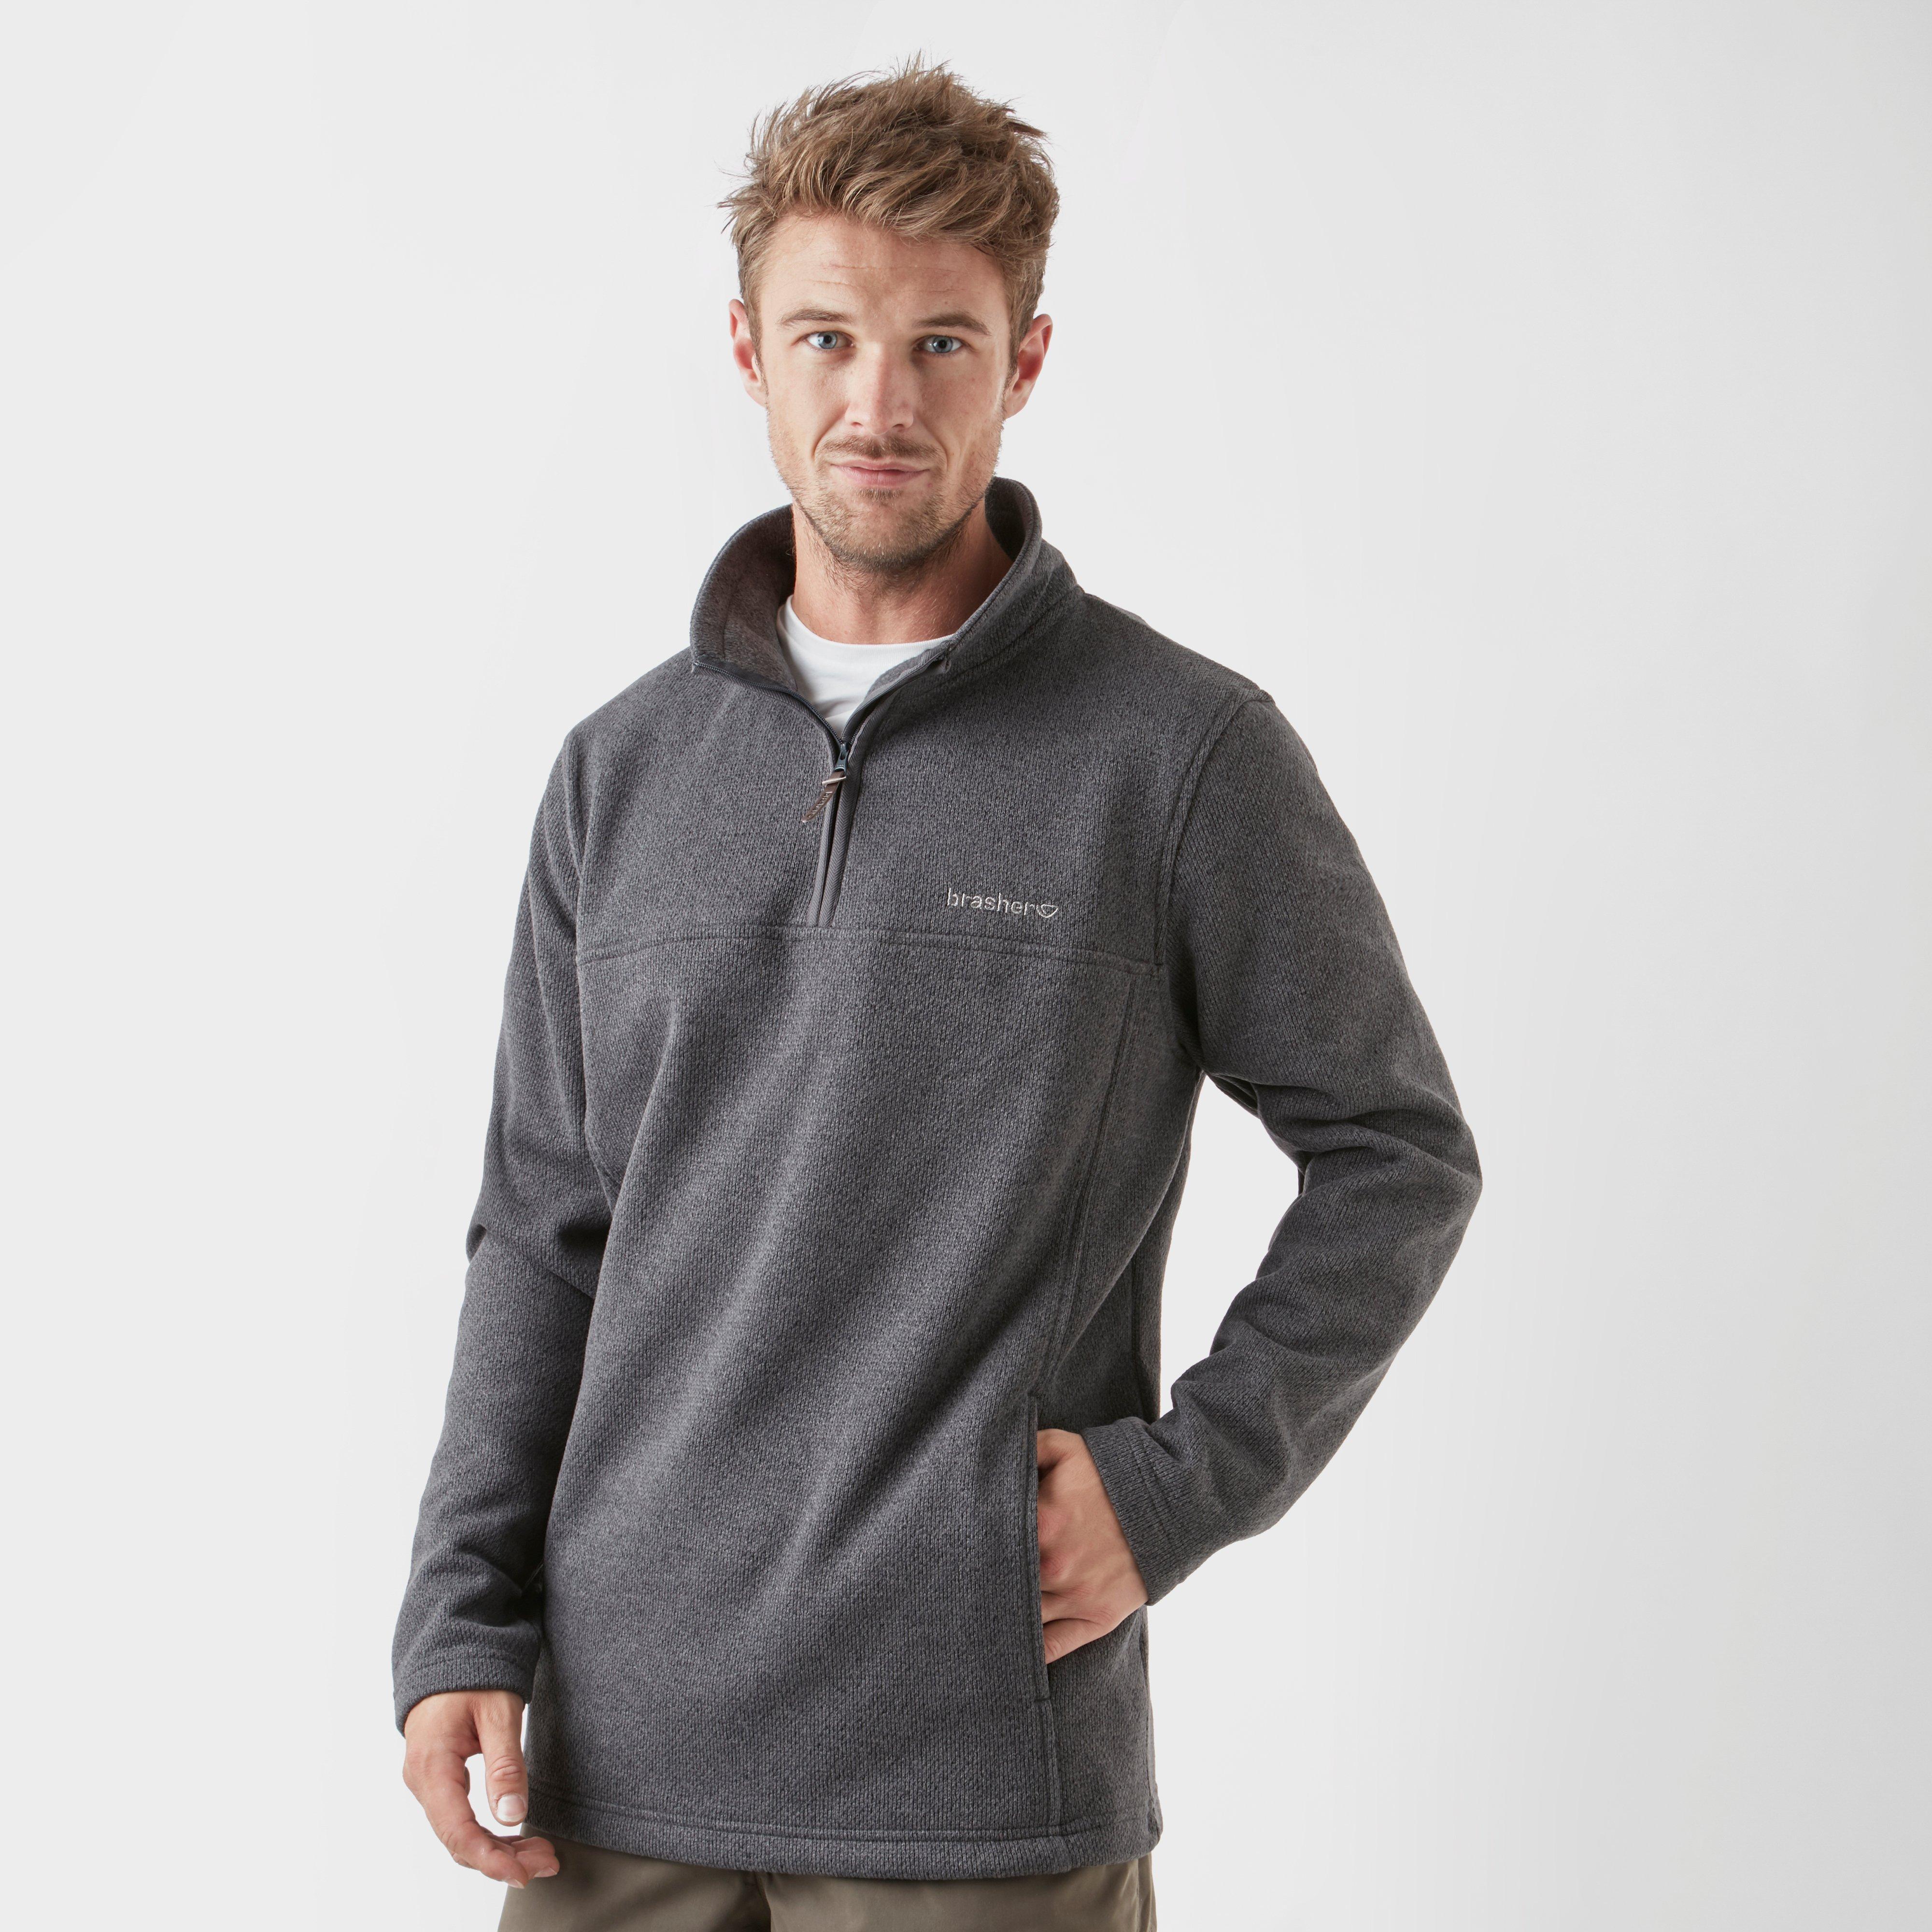 Brasher Brasher Mens Fairfield Quarter-Zip Fleece - Grey, Grey